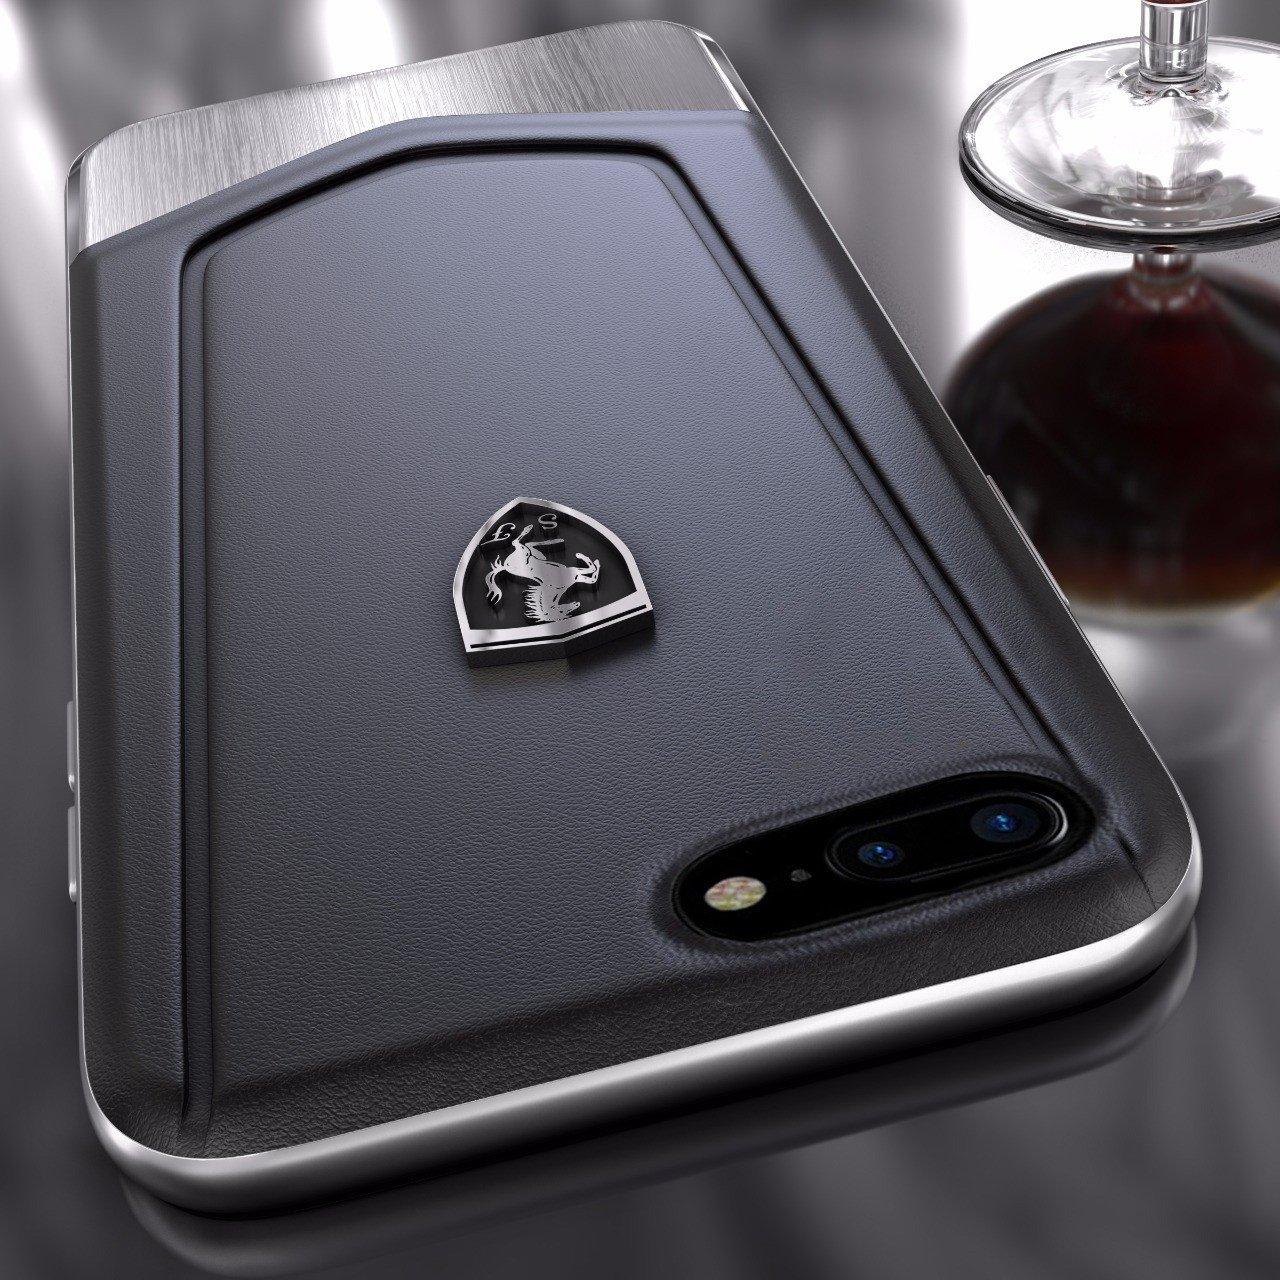 ffc4ef834 Ferrari ® Apple iPhone 7 Plus Moranello Series Luxurious Leather + Metal  Case Limited Edition Back